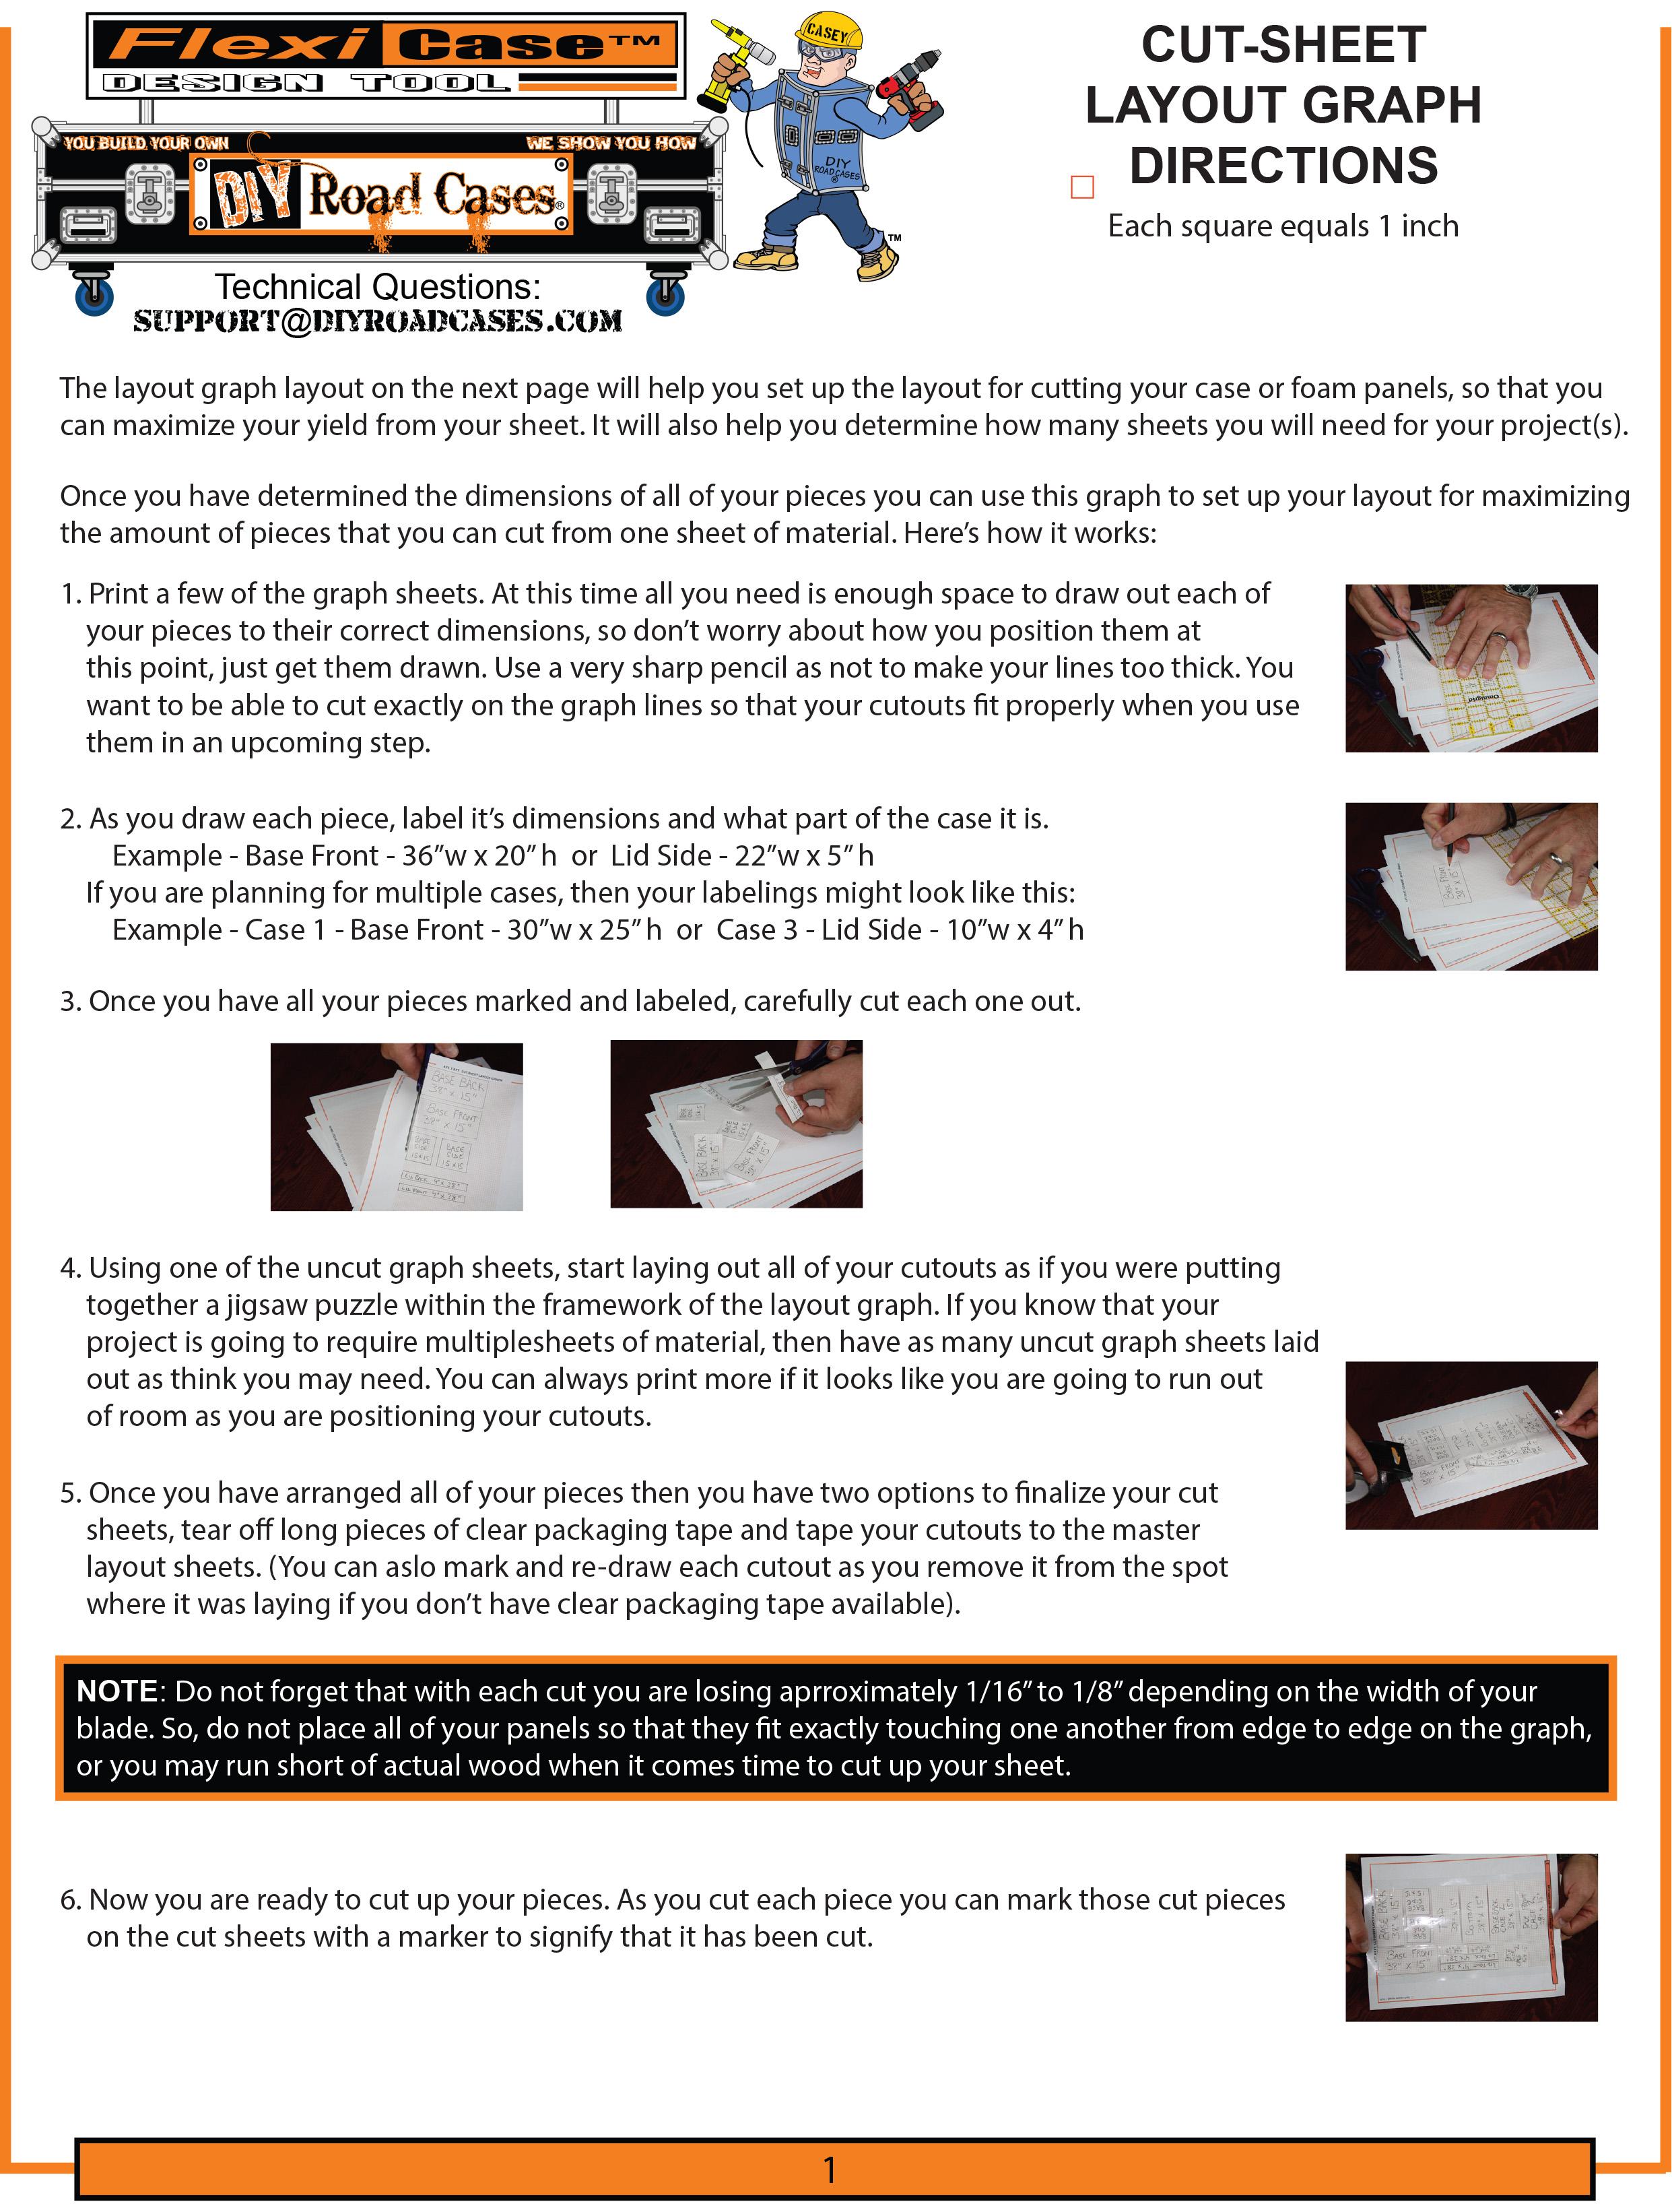 cut-sheet-layout-graph-instructions-generic.jpg